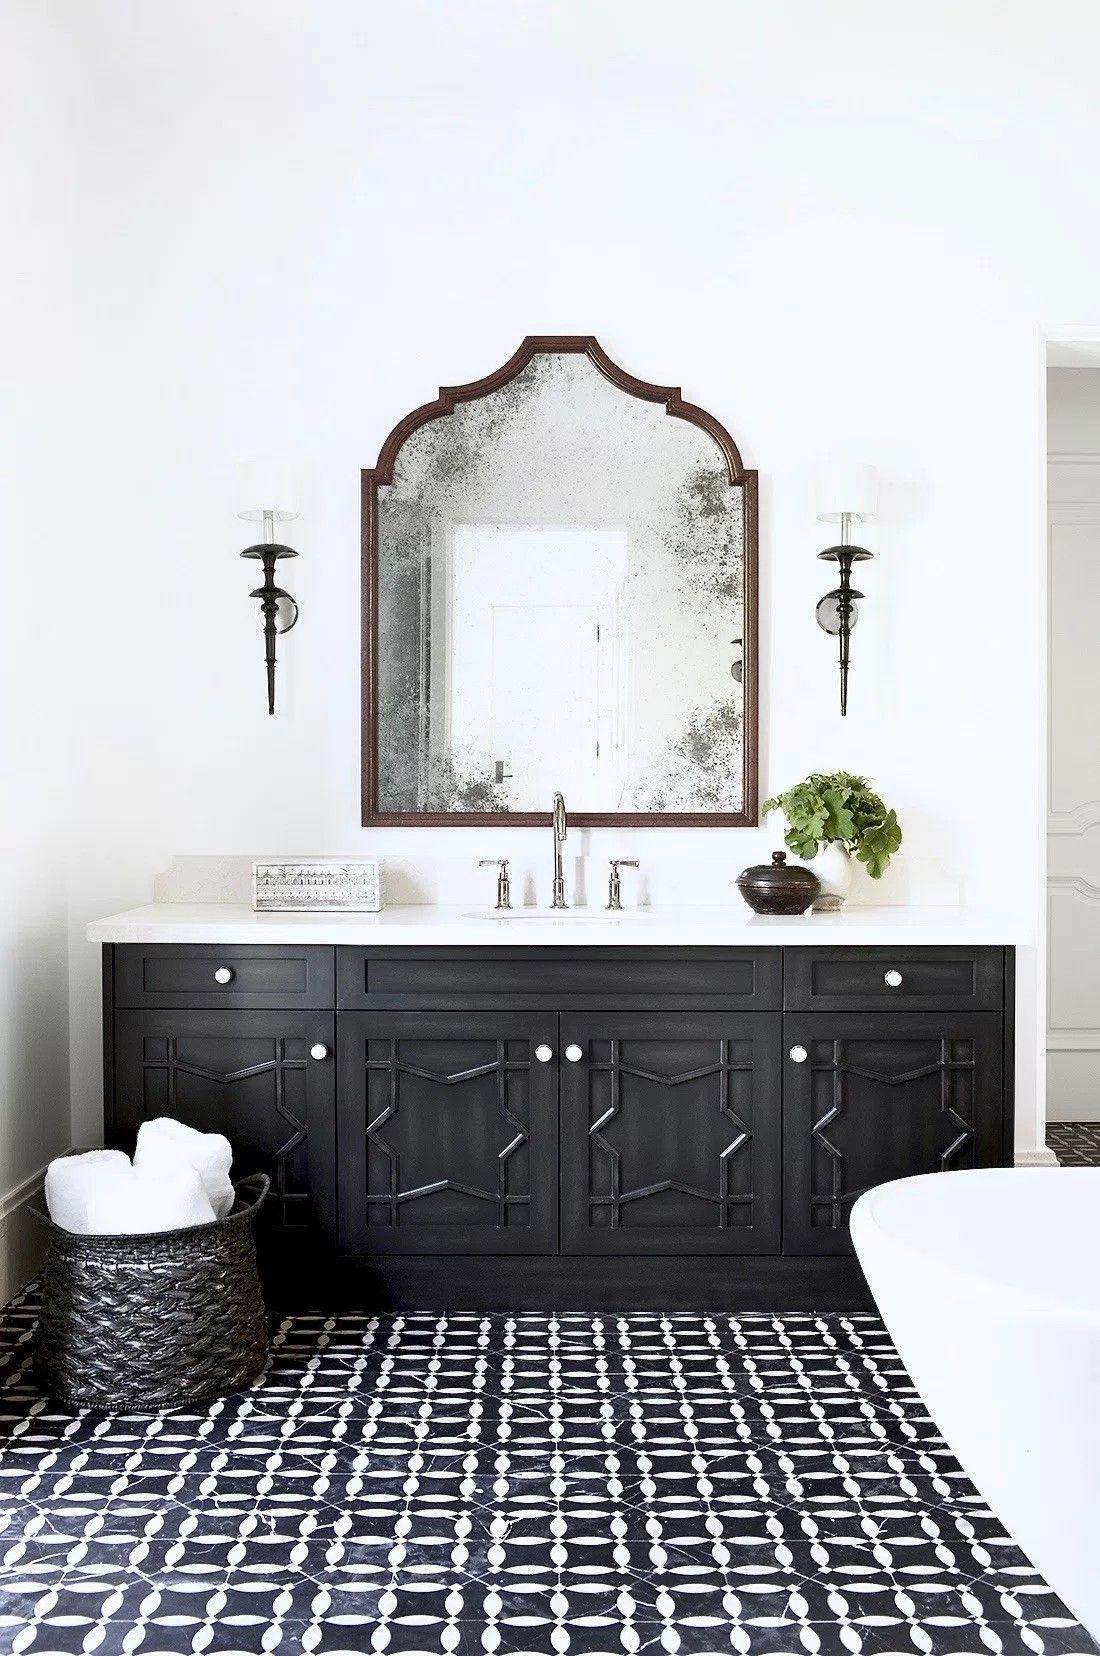 Pinterest - Andie | Home | Pinterest | Bath, Bathroom storage and ...